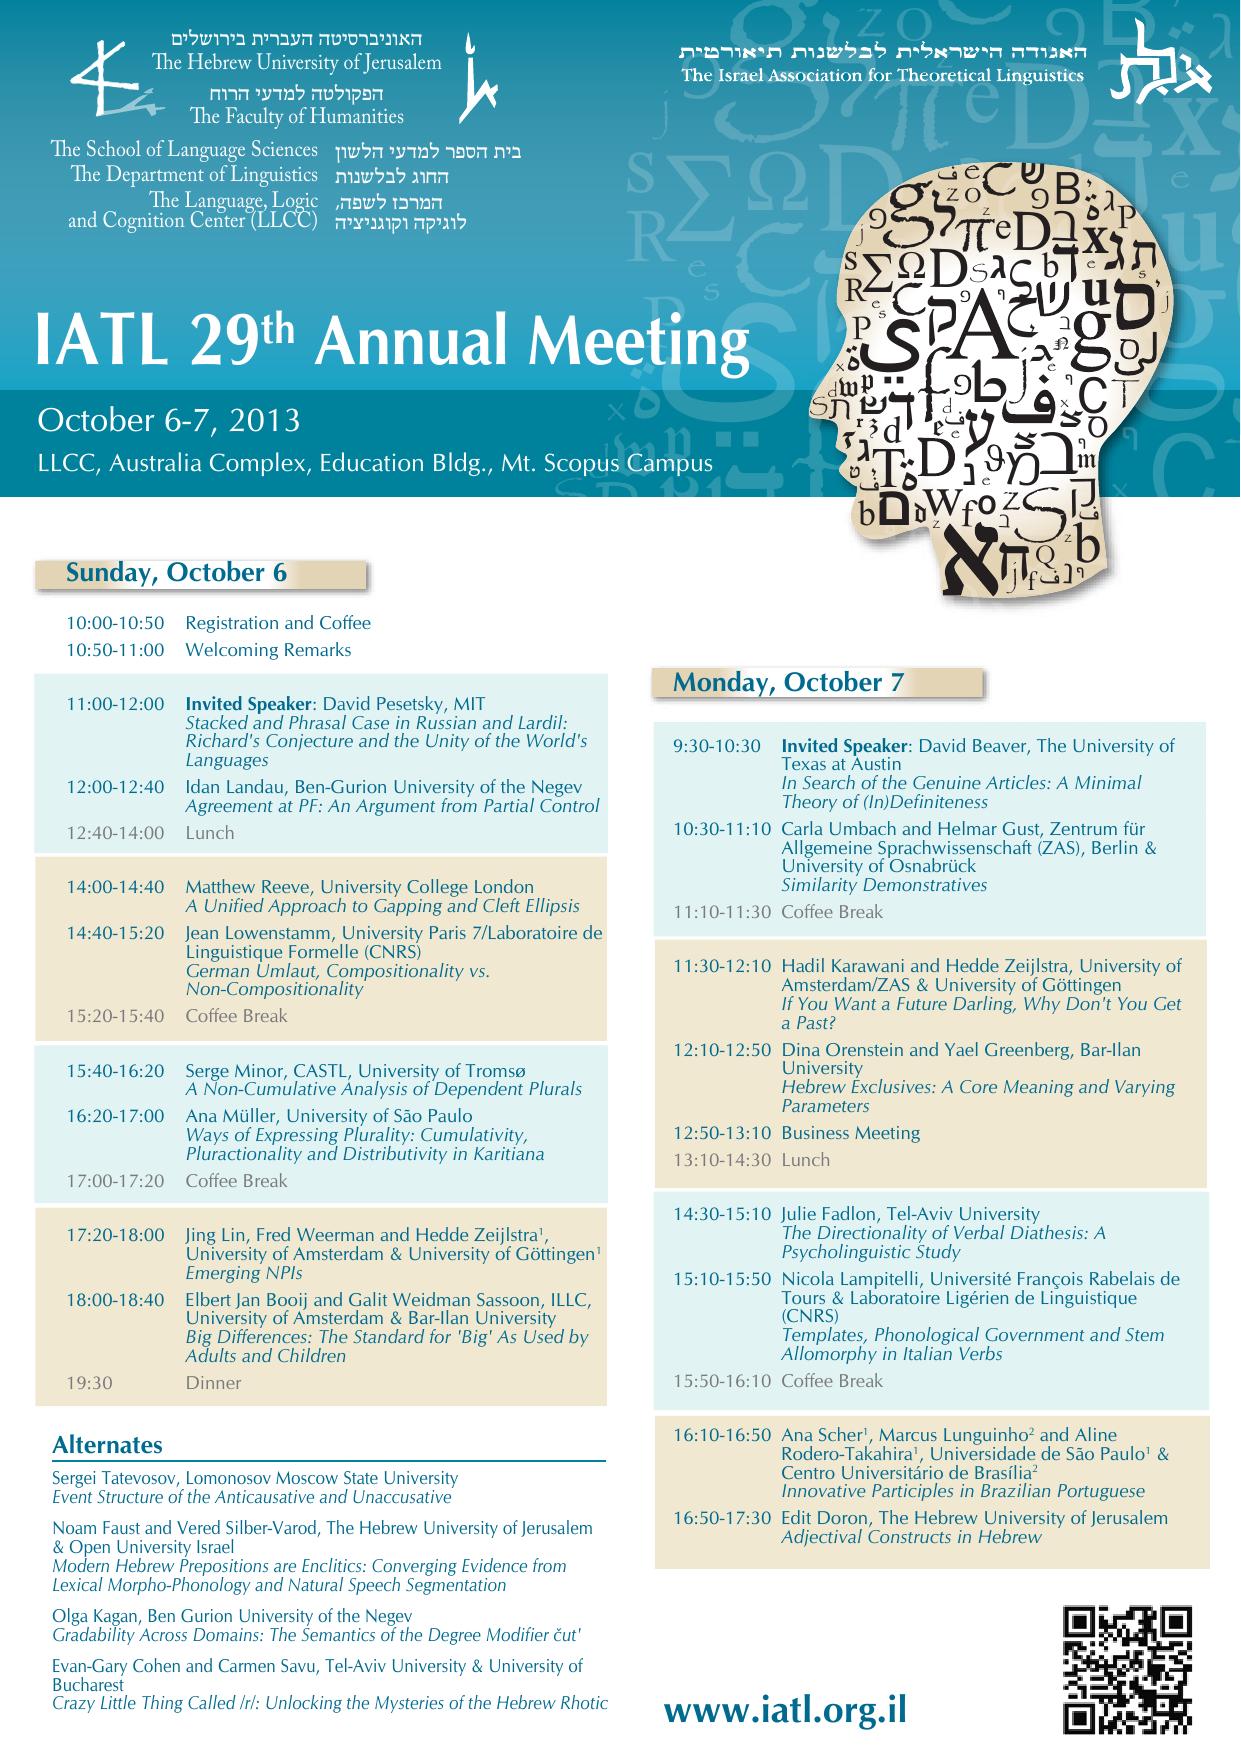 IATL 29, Oct 2013, HUJI, Poster-1